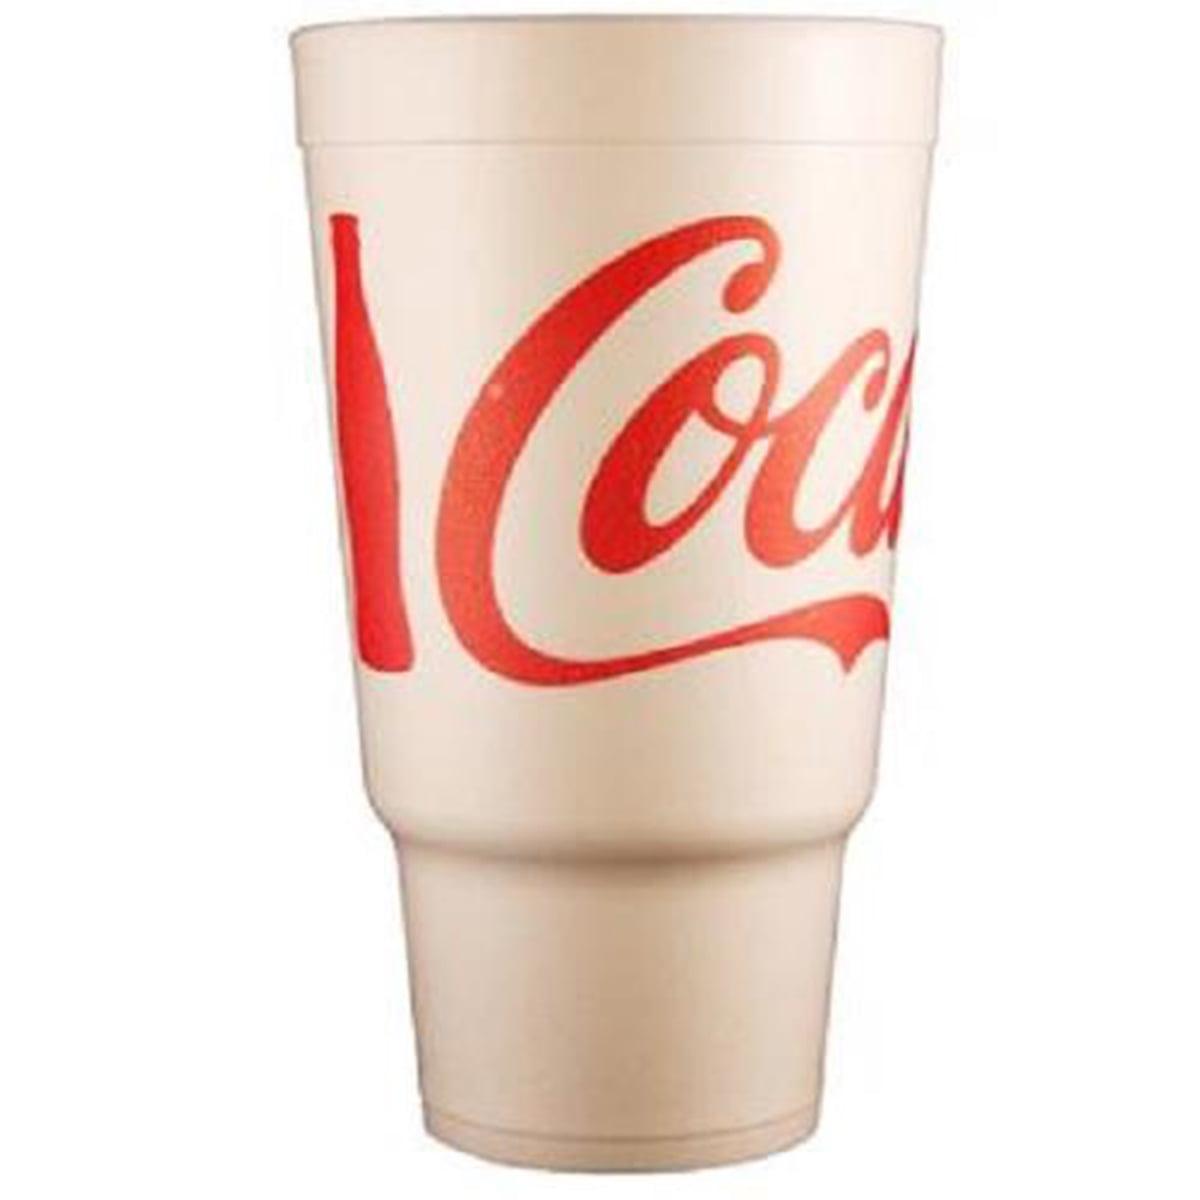 Product Of Dart, Foam Cup Coke 32 oz, Count 400 - Cups/Plate/Bowls / Grab Varieties & Flavors